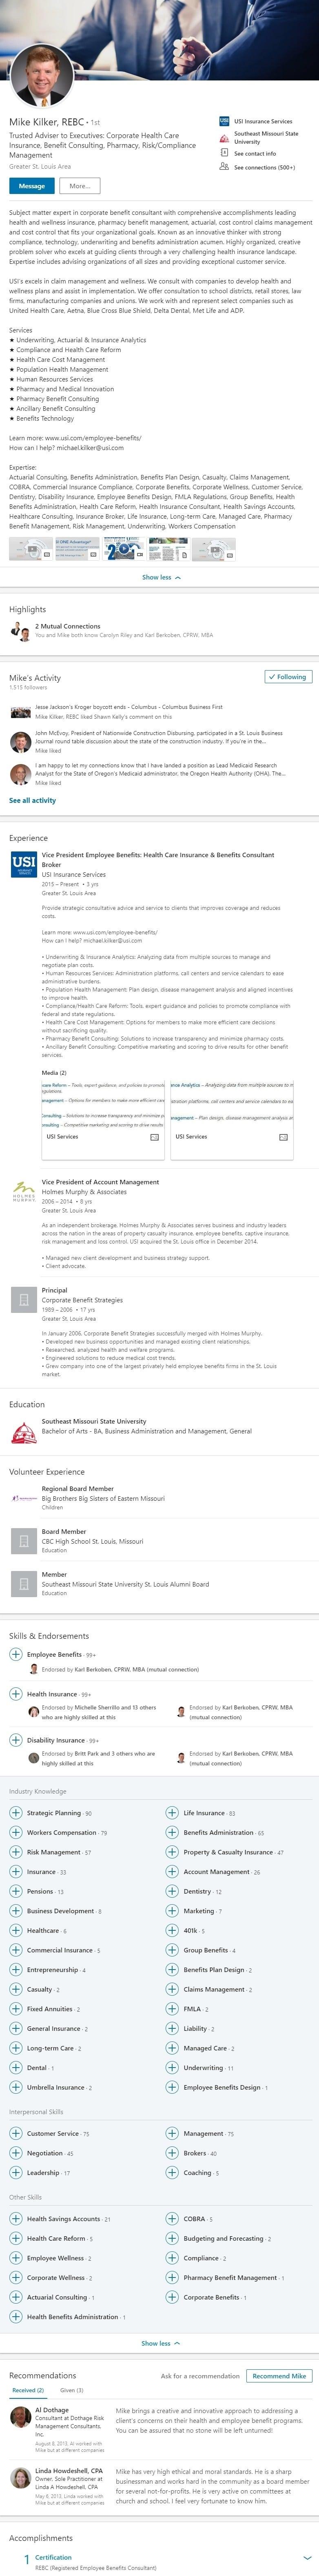 Sample Linkedin Profile example insurance benefits consultant 2140